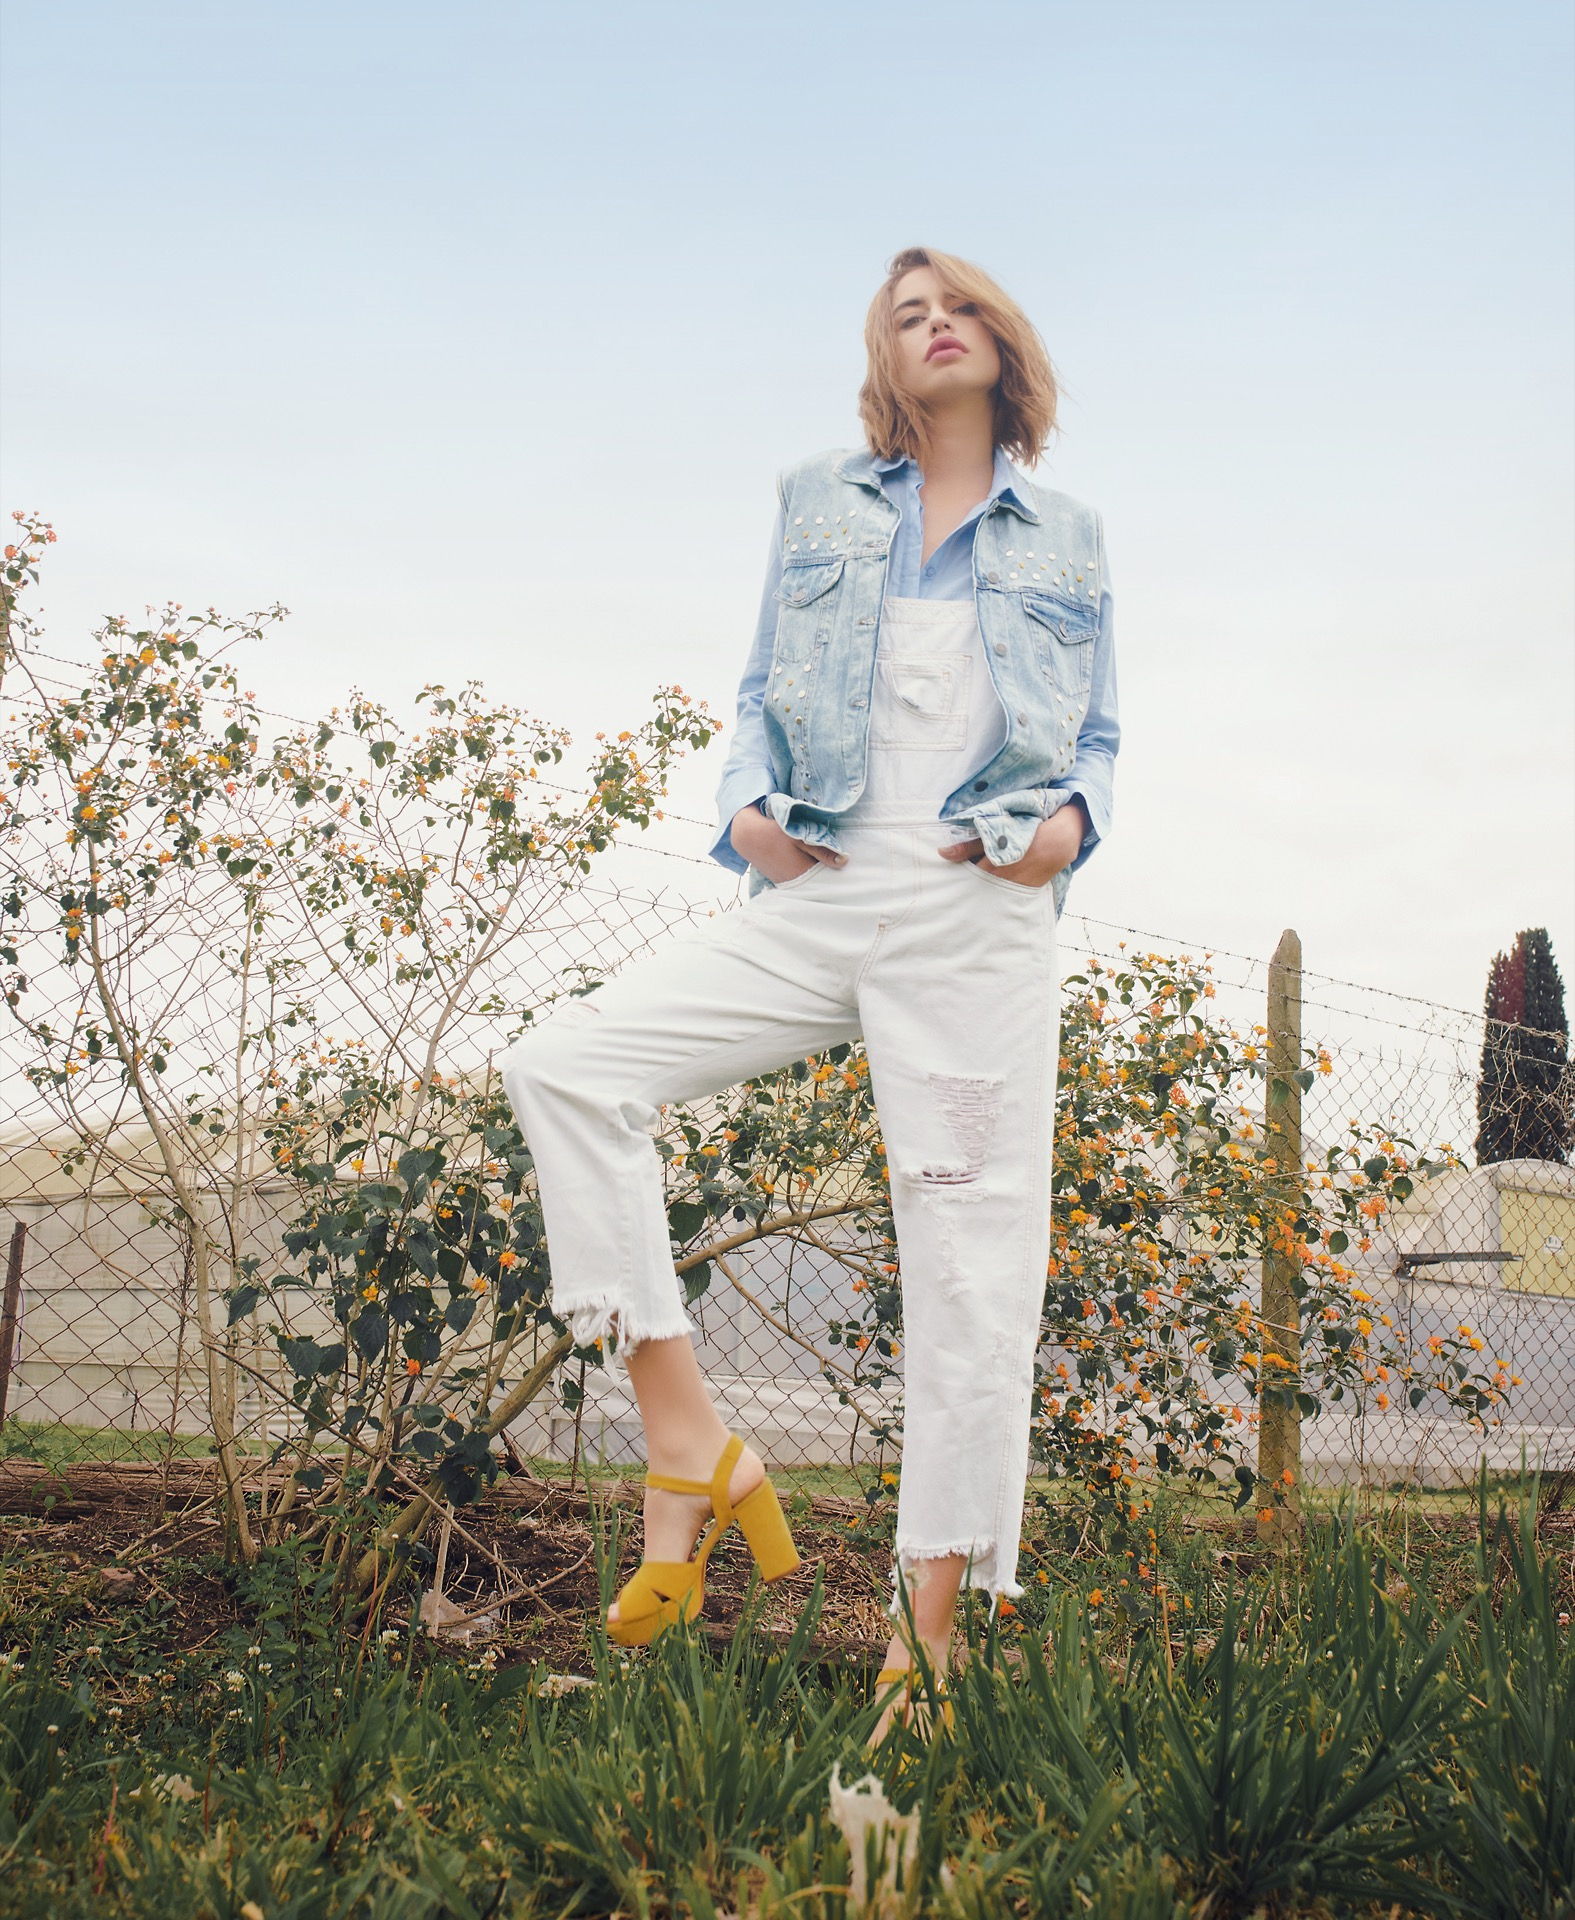 Chaleco de jean con tachas ($ 2.900, Uma), camisa con encaje ($ 1.890, Ossira), jardinero de jean con roturas ($ 2.500, Lovely Denim) y sandalias de gamuza ($ 3.850, Sofi Martiré).Foto Juan Jauregui/ Para Ti